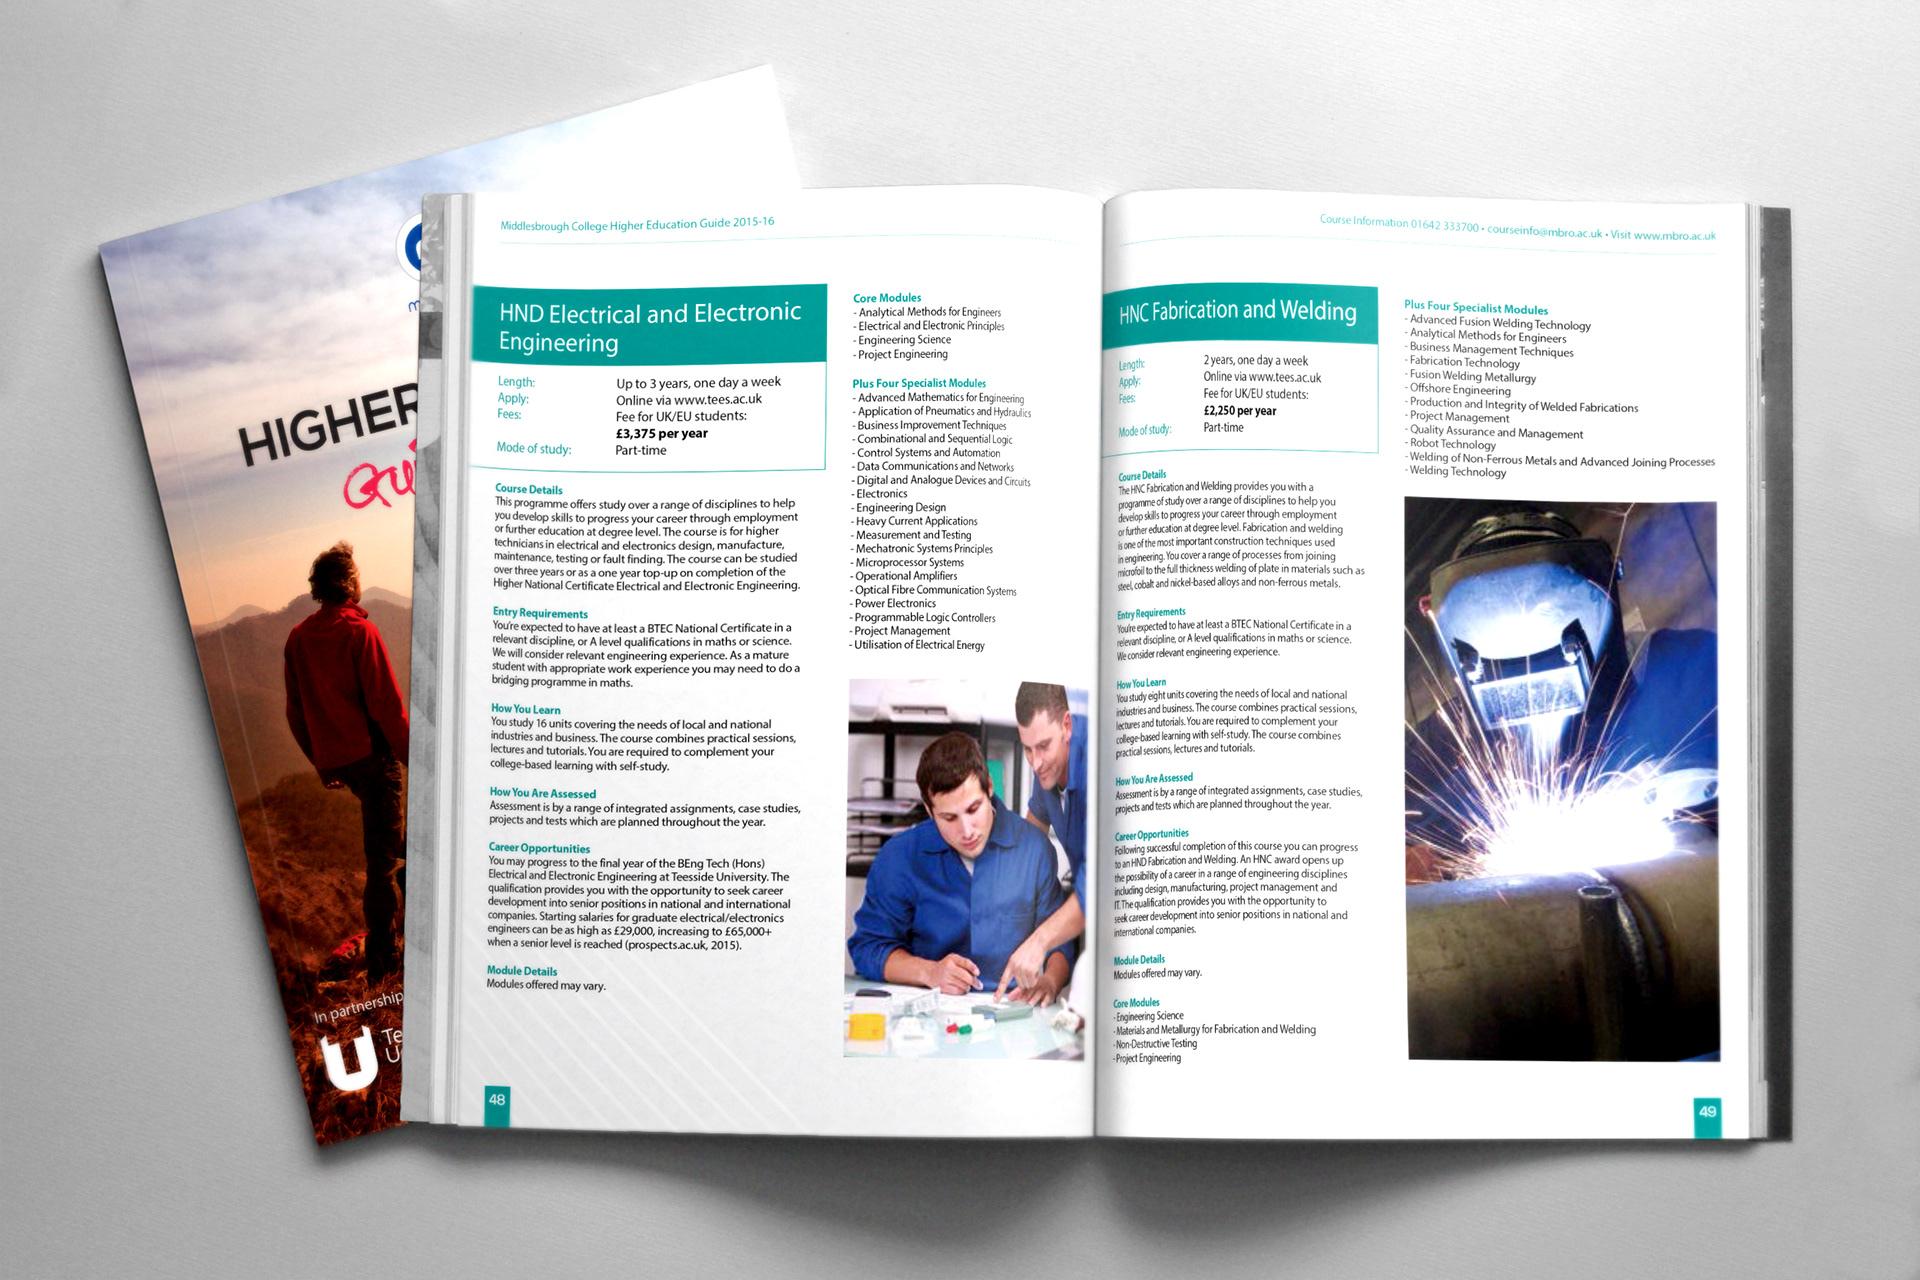 Higher Education Guide 2015-16 on Behance